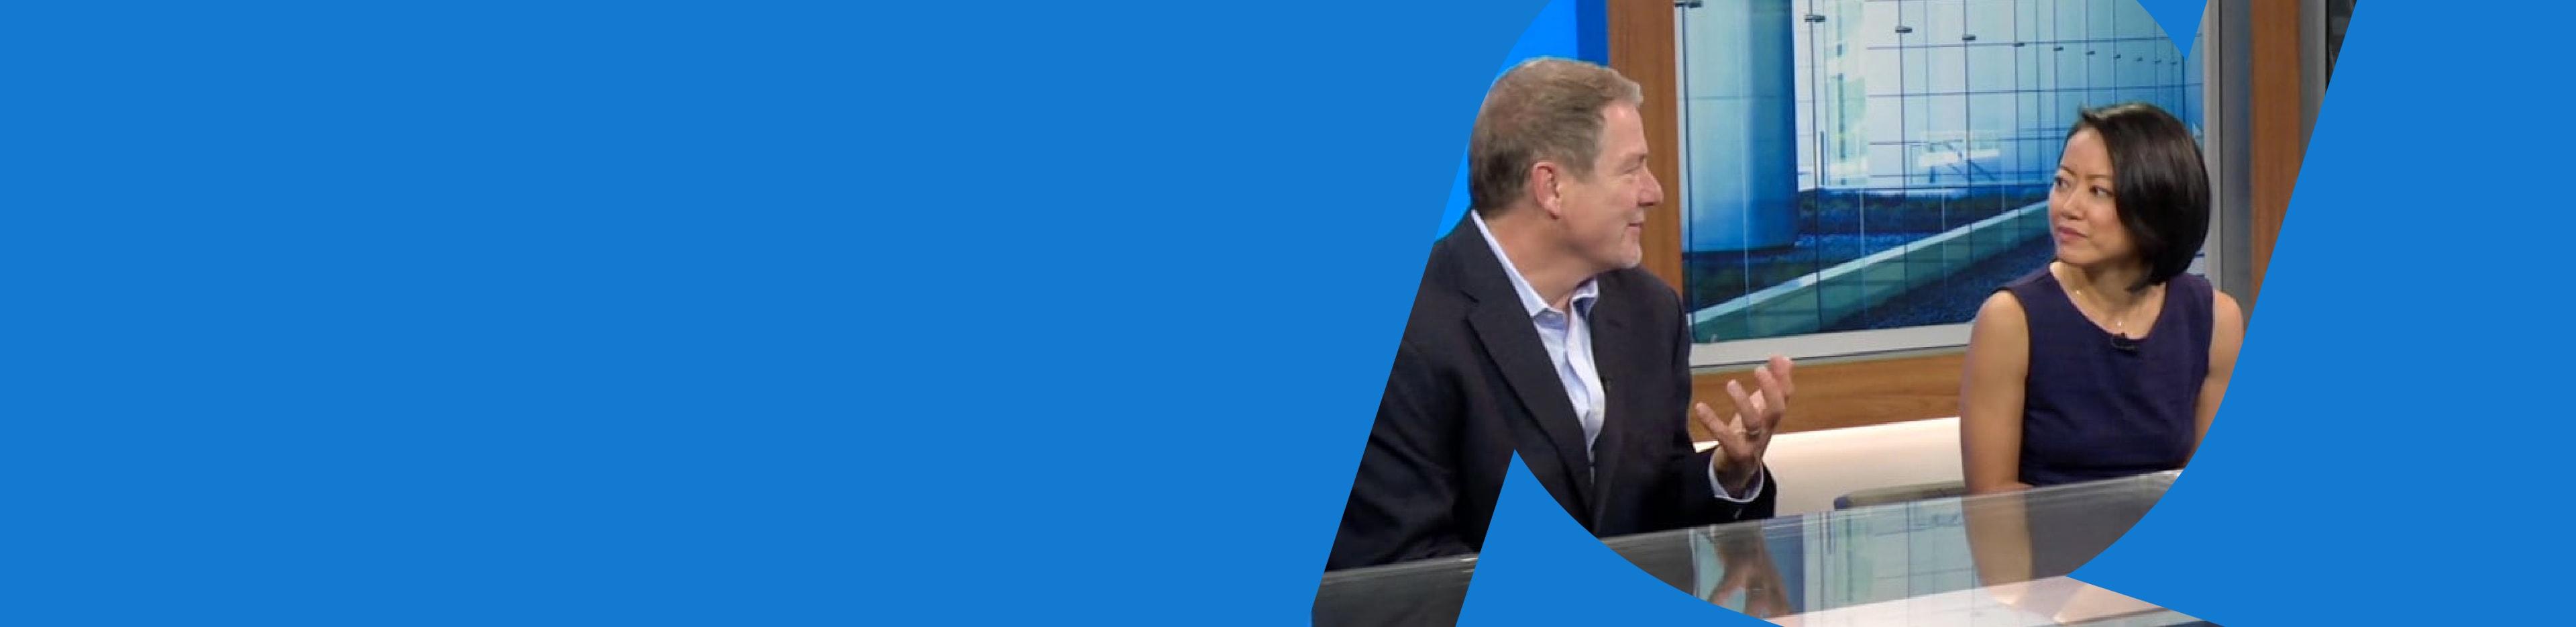 Bret Arsenault, Microsoft CISO, and Joy Chik, CVP of Identity, having a conversation.